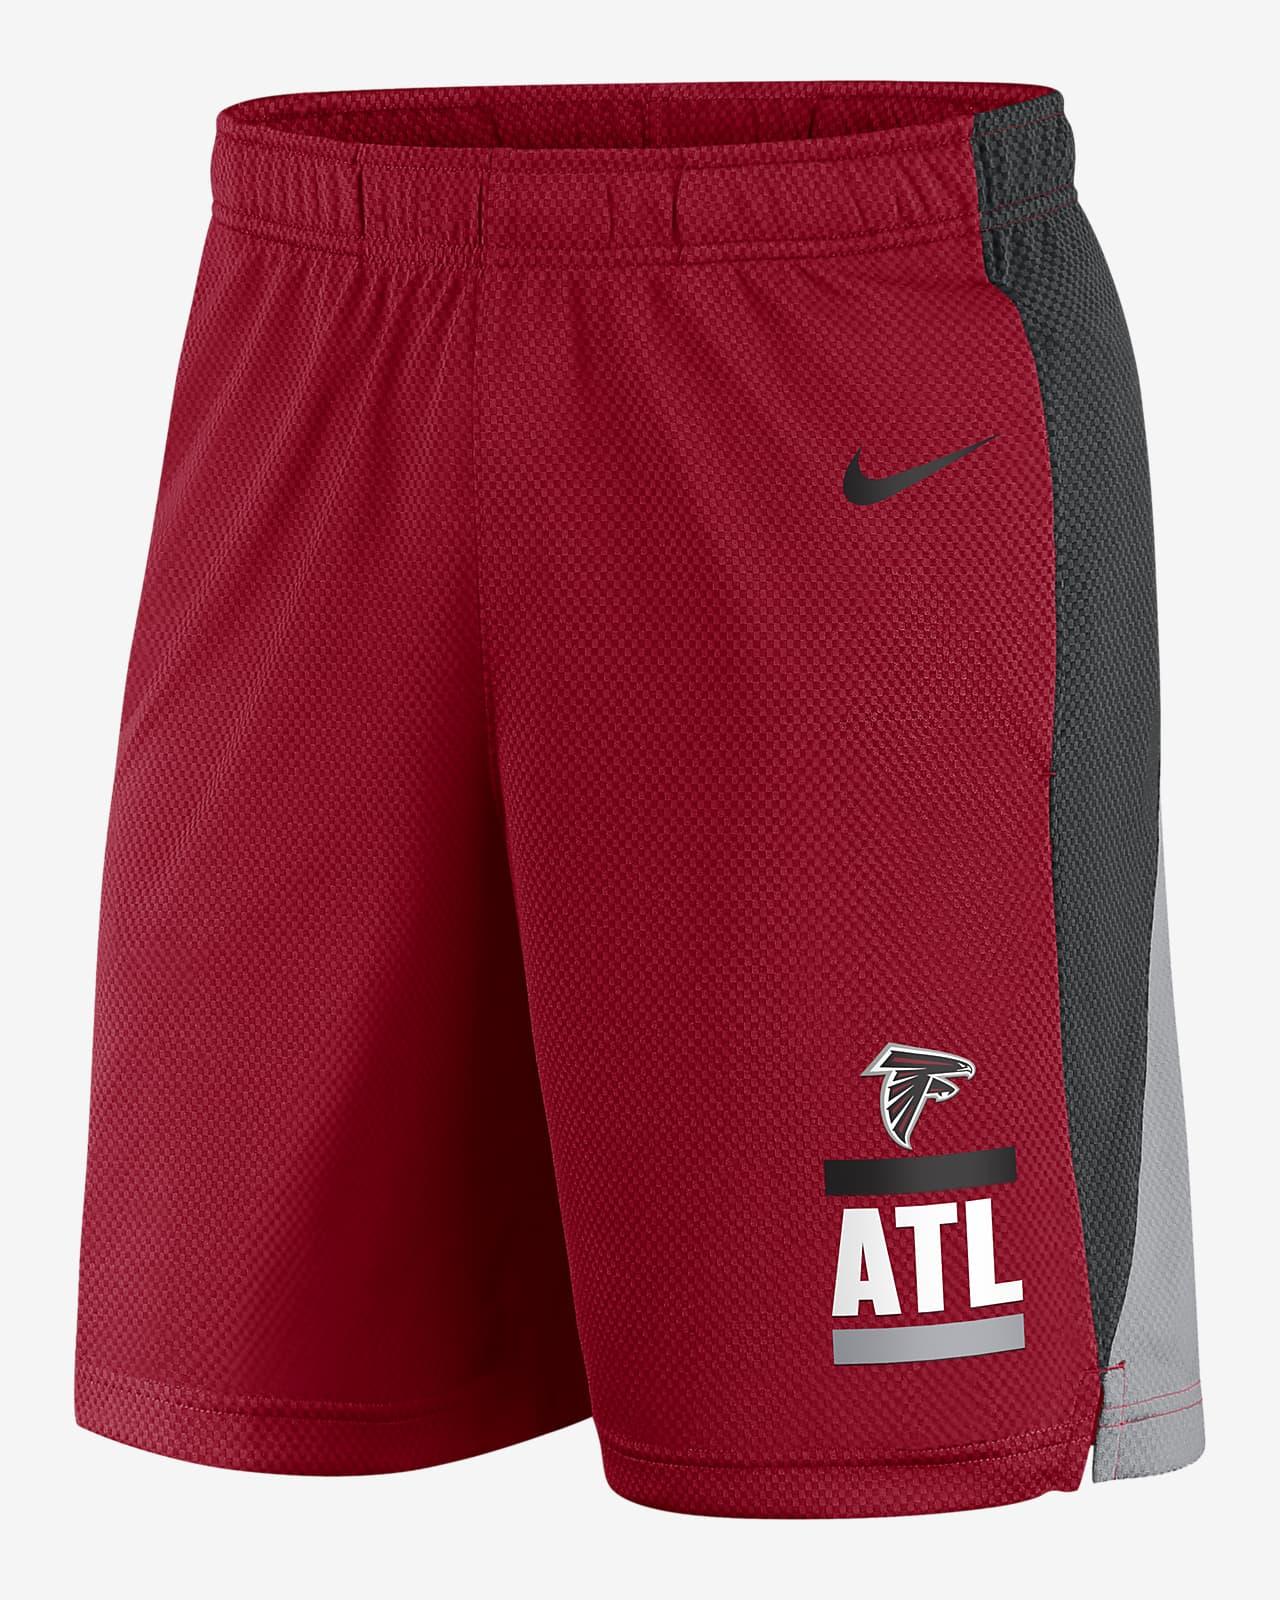 Nike Dri-FIT Broadcast (NFL Atlanta Falcons) Men's Shorts